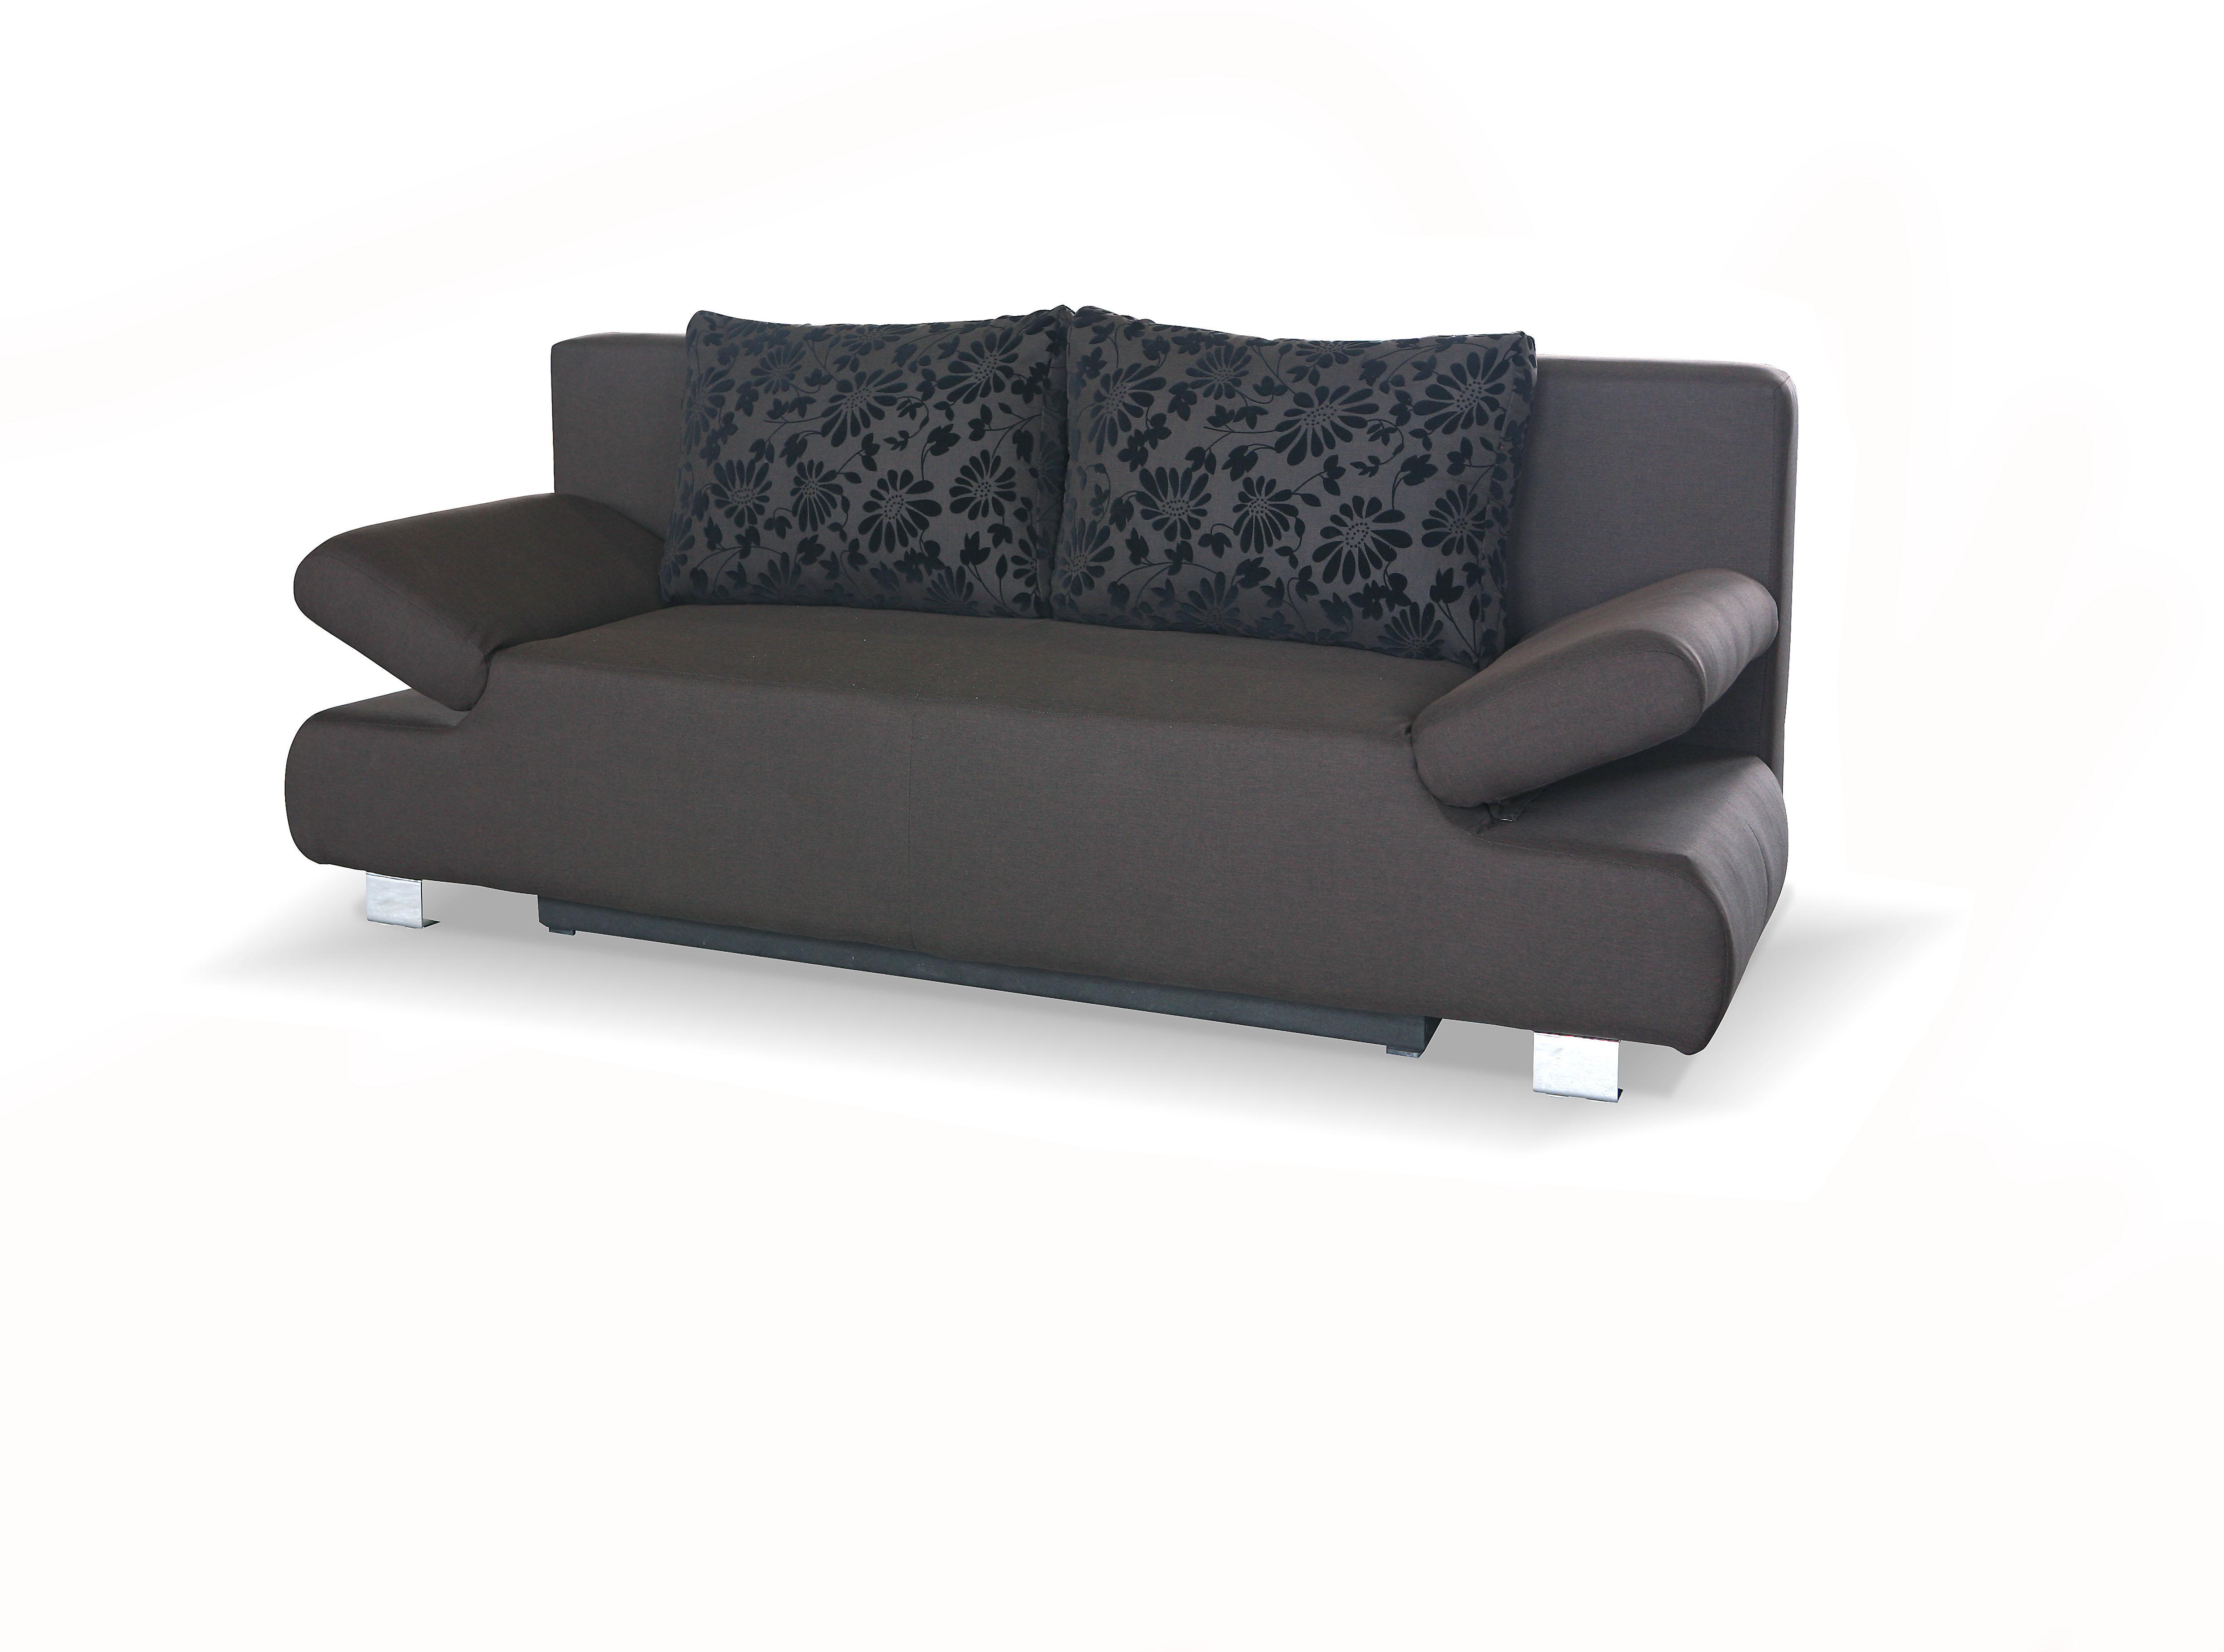 sam schlafsofa braun sofa reno 210 cm g nstig. Black Bedroom Furniture Sets. Home Design Ideas